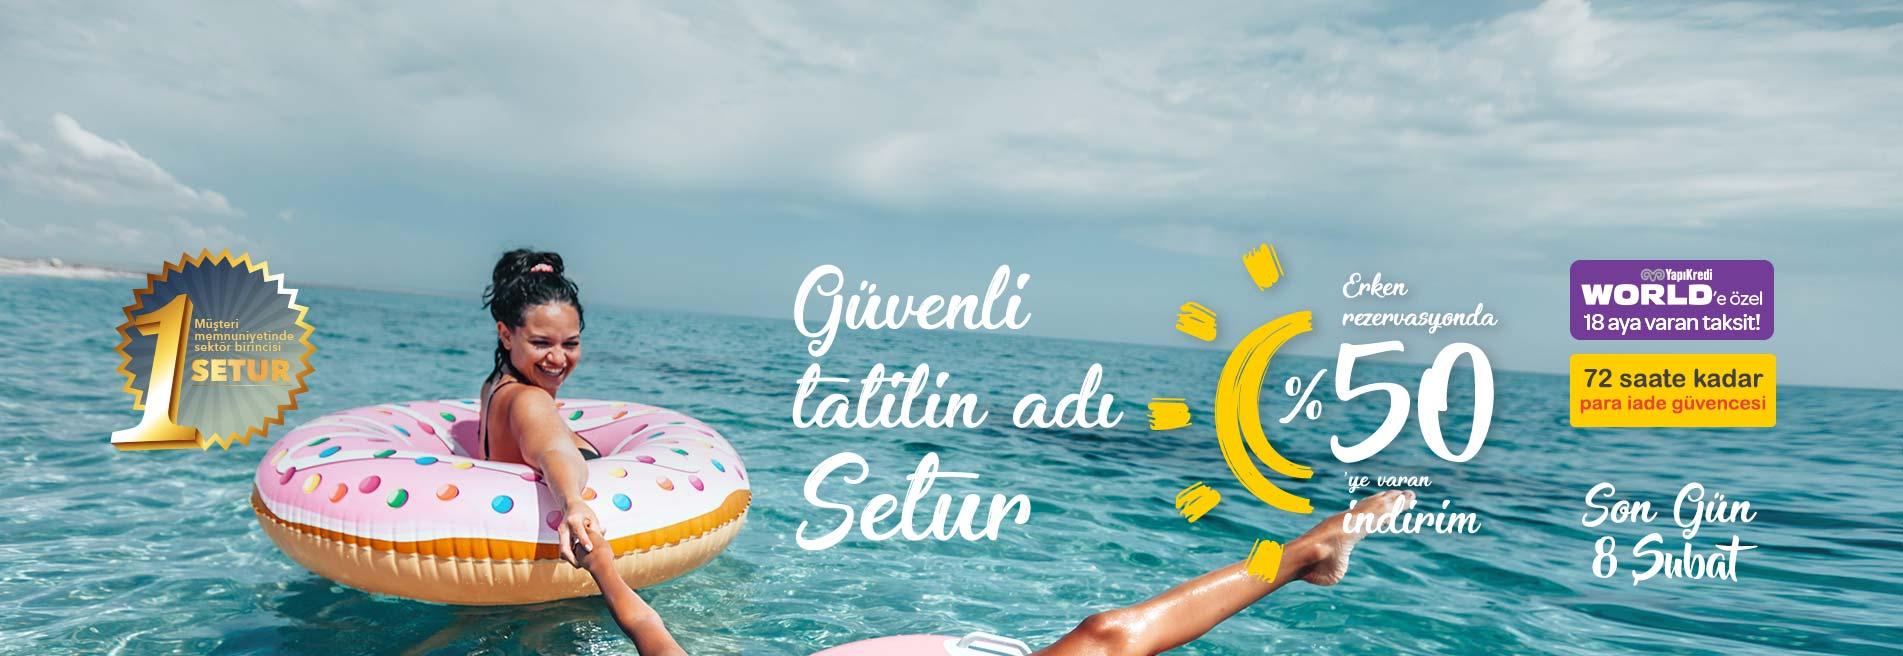 2021 Erken Rezervasyon Otelleri